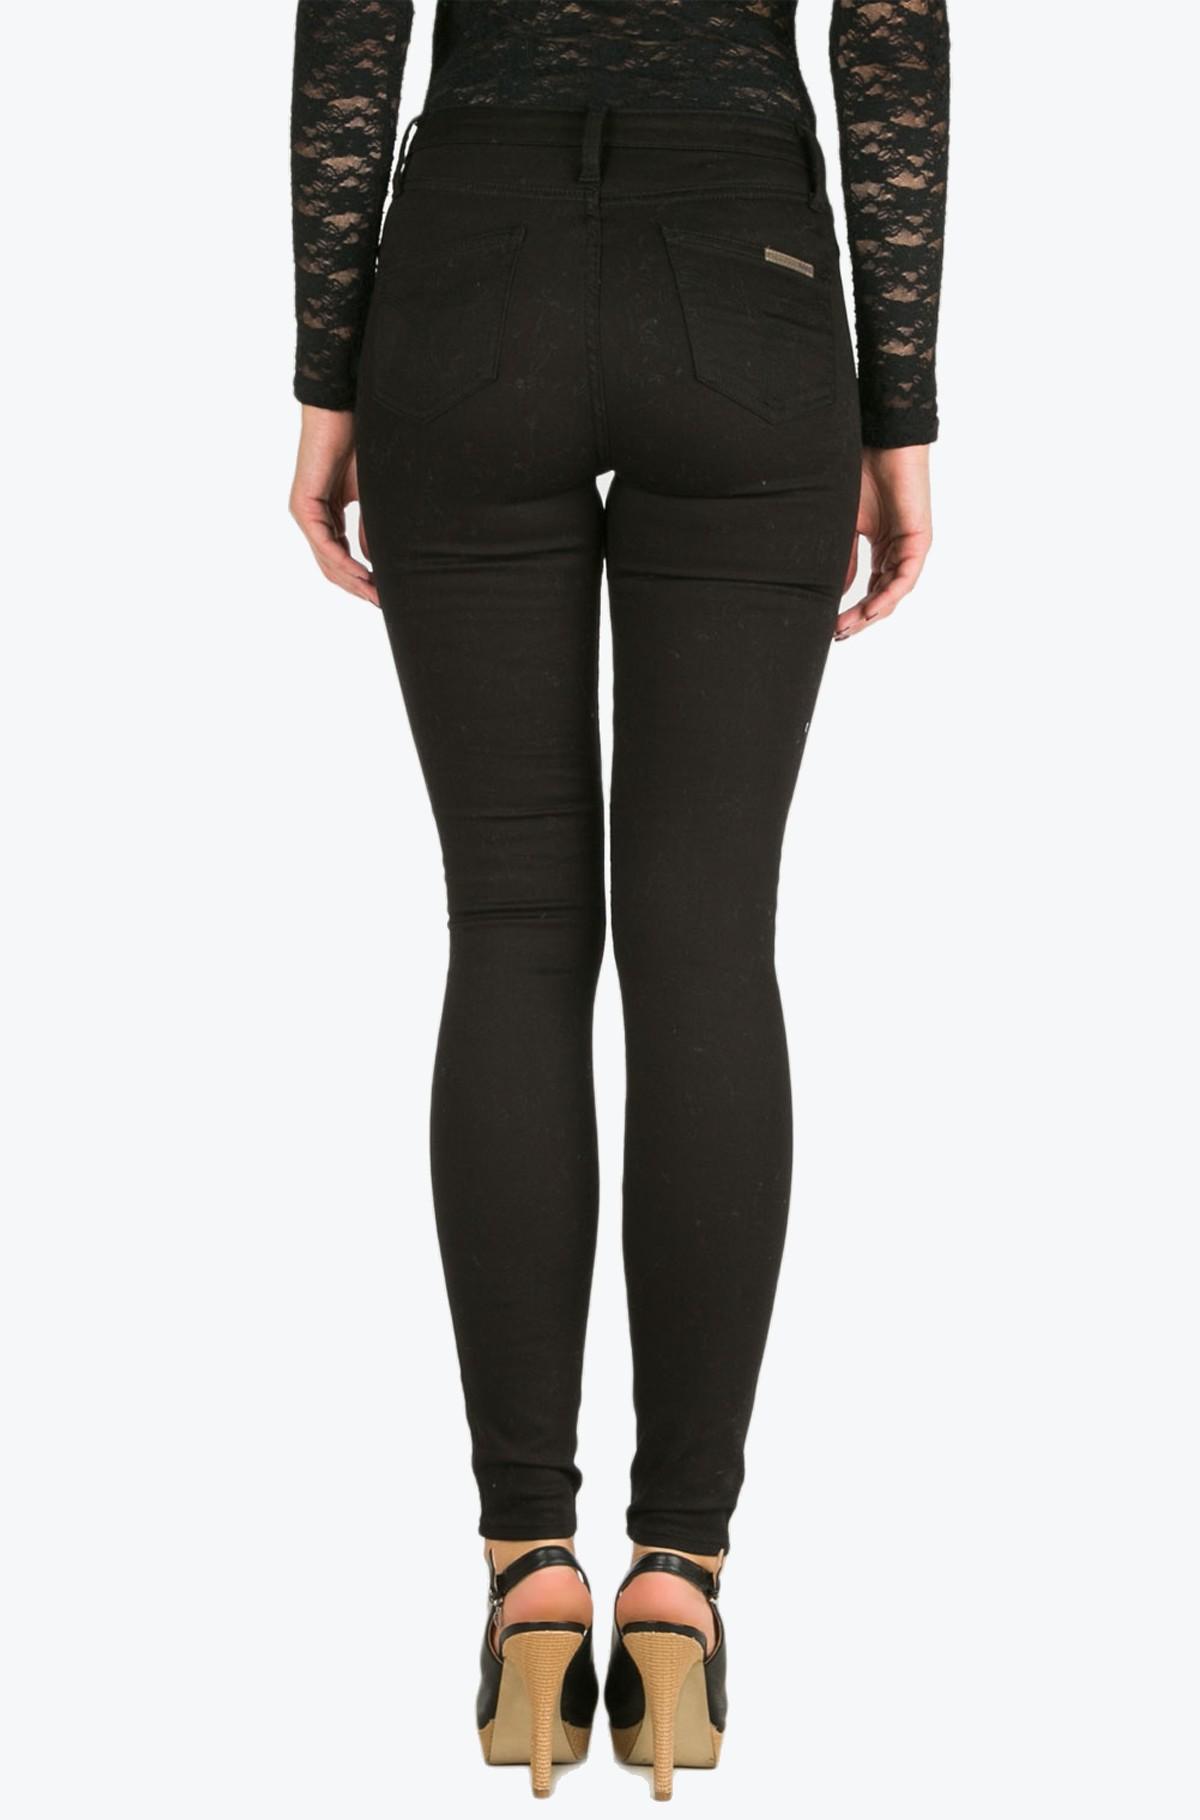 Džinsinės kelnės Sculpted Skinny - Infinite Black Str-full-2